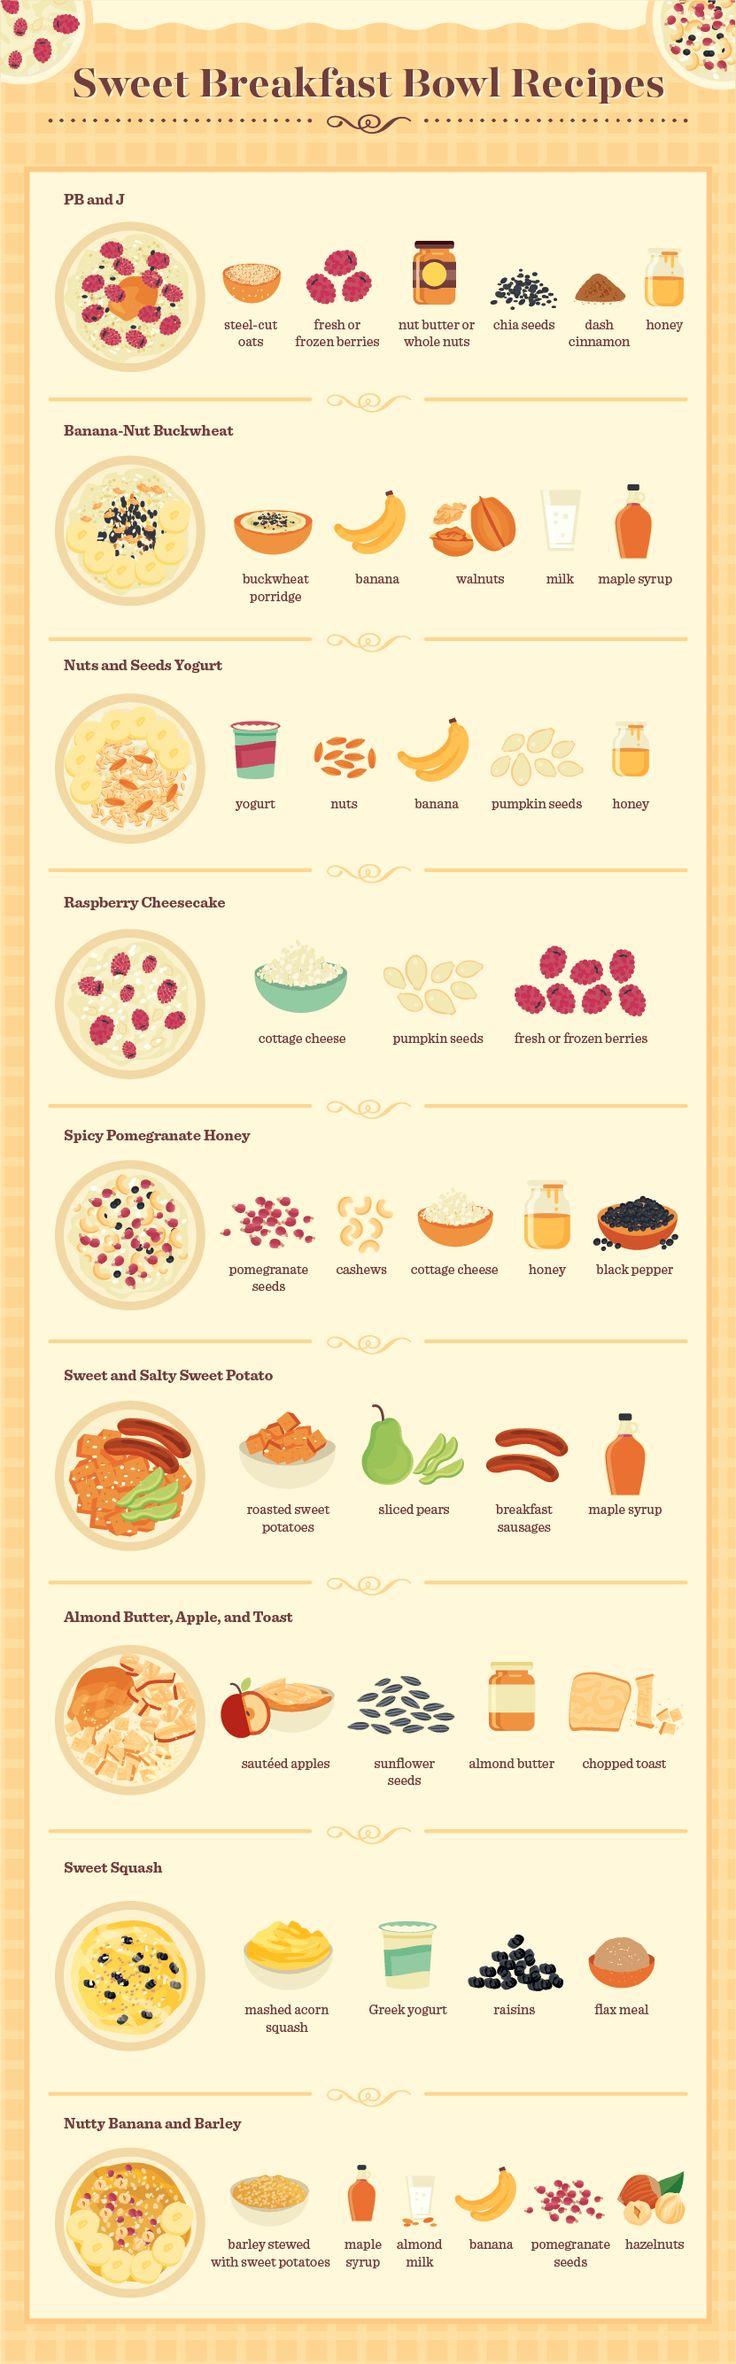 Sweet Breakfast Bowl Recipes